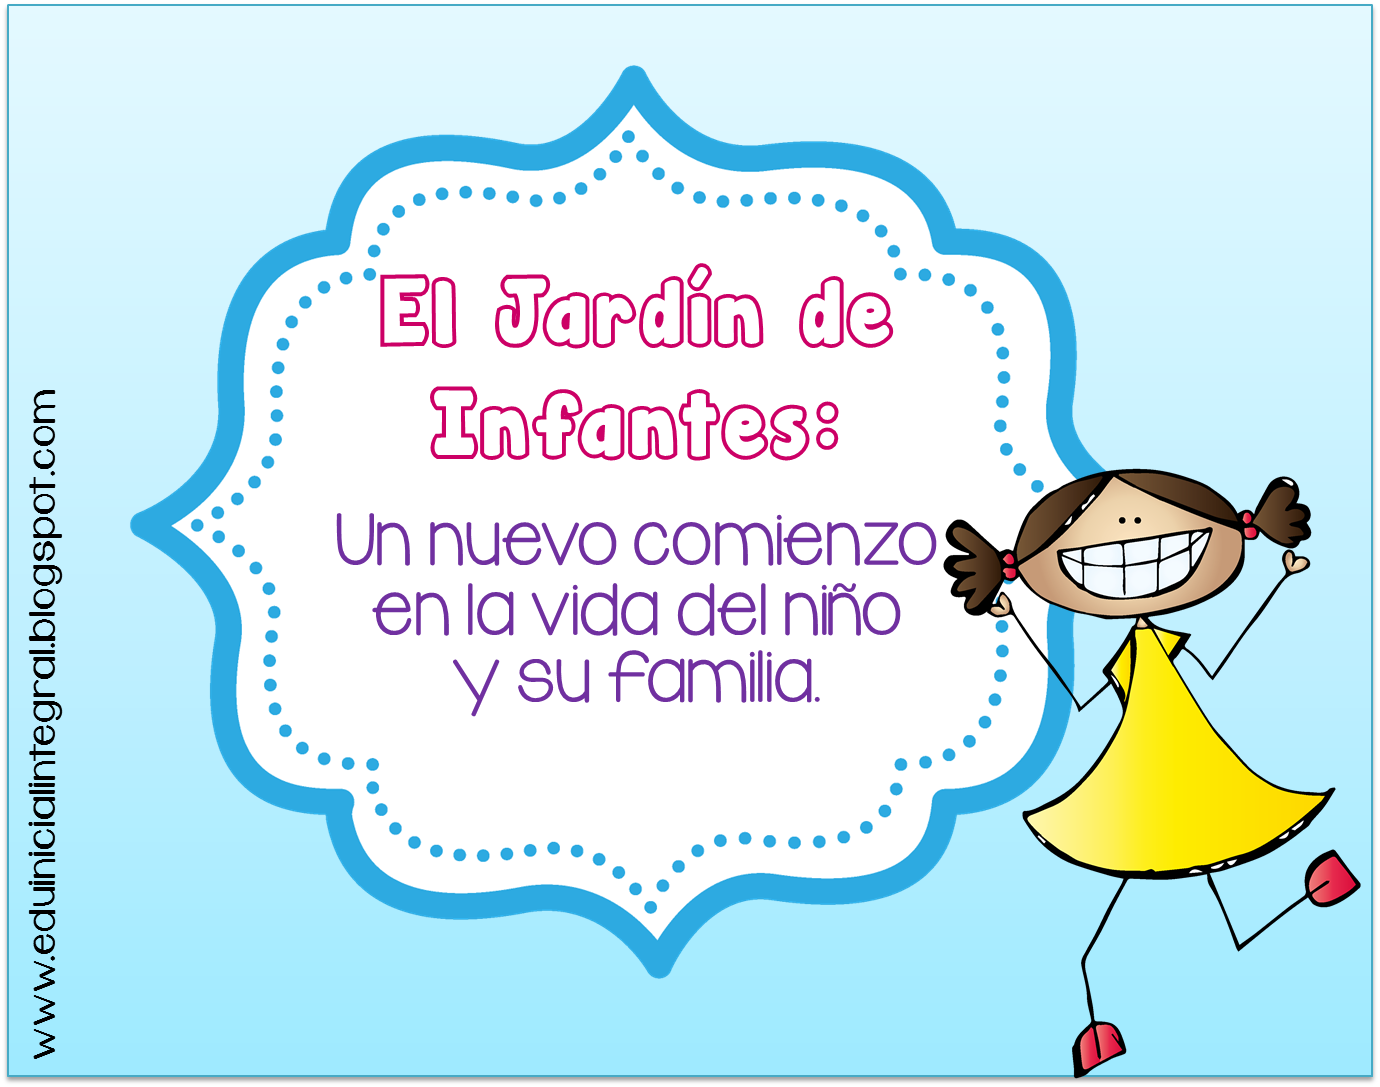 Frases para tarjetas de jardin de infantes for Jardin de infantes